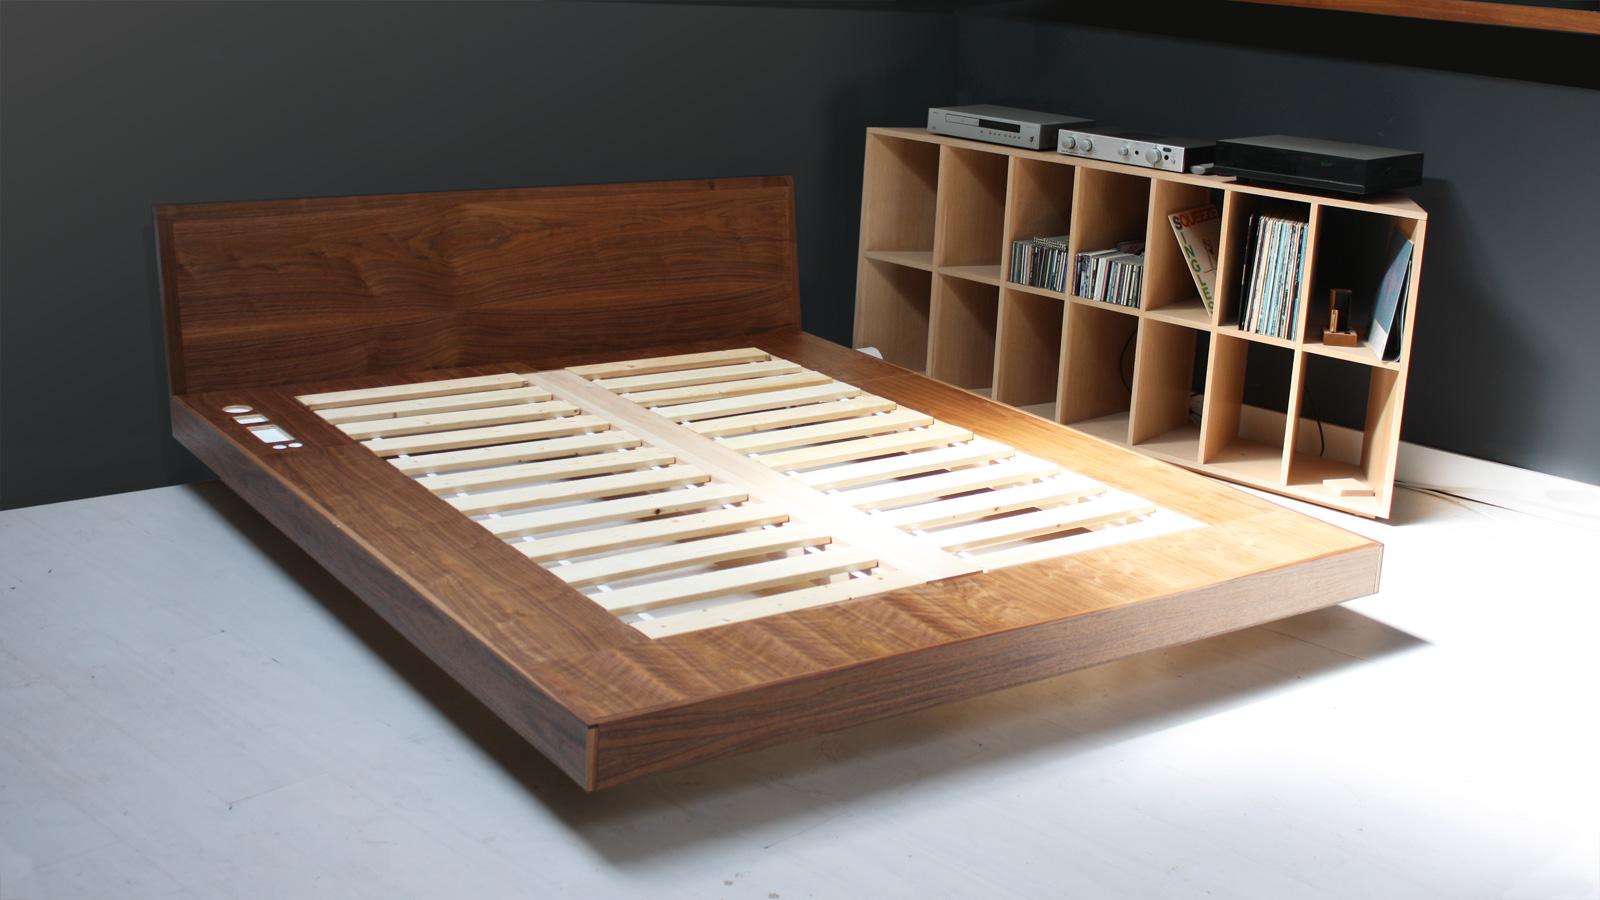 Ruby Princess Deck Plan & Free Platform Bed Plans | DIY Woodworking